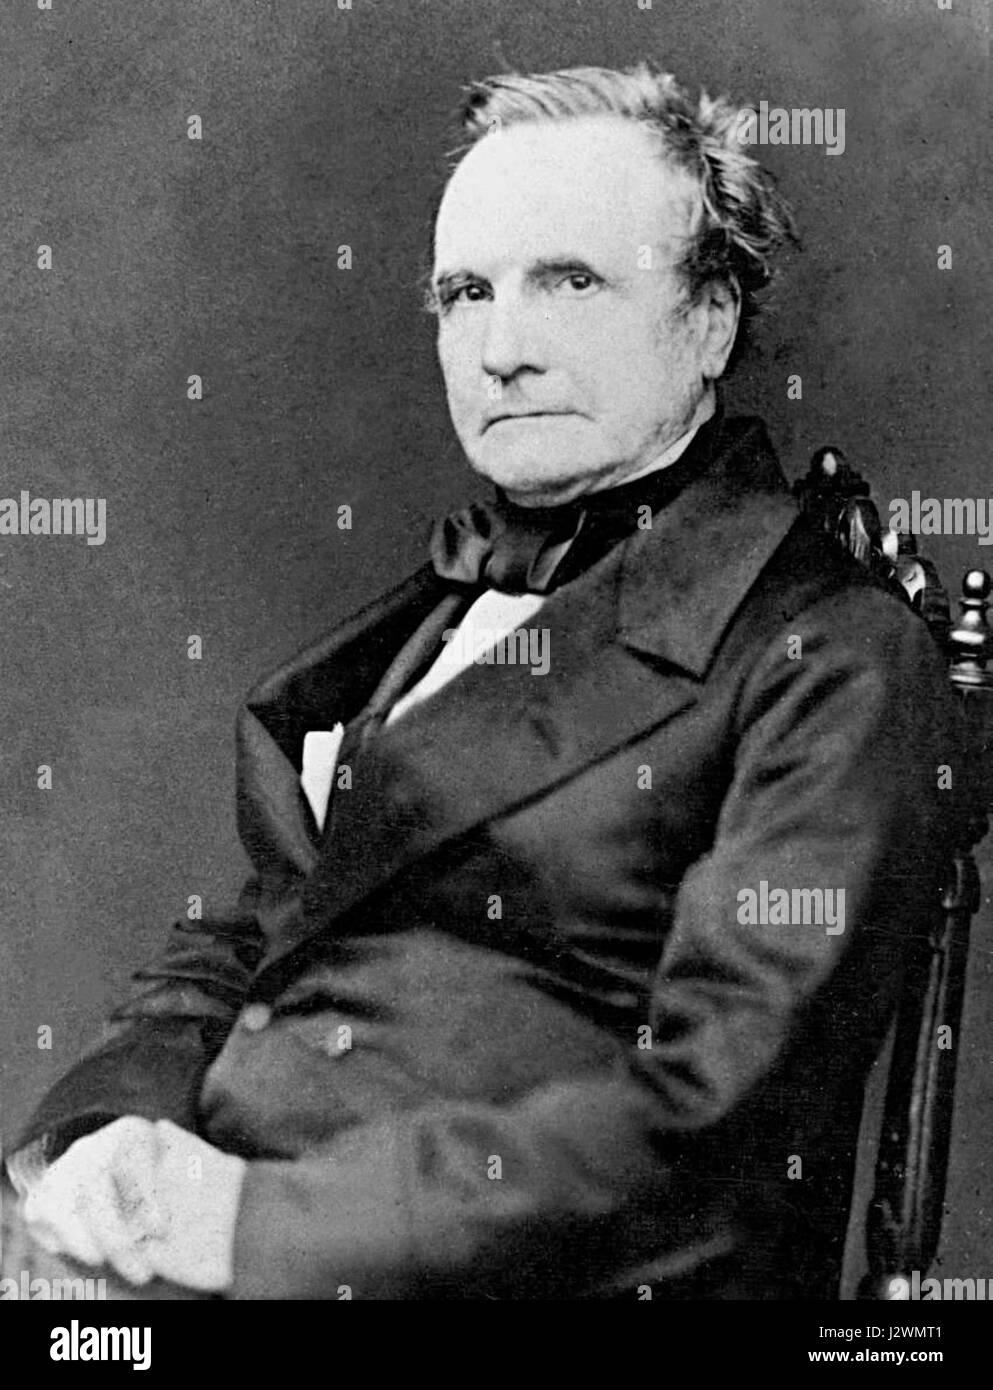 Charles Babbage - 1860 - Stock Image